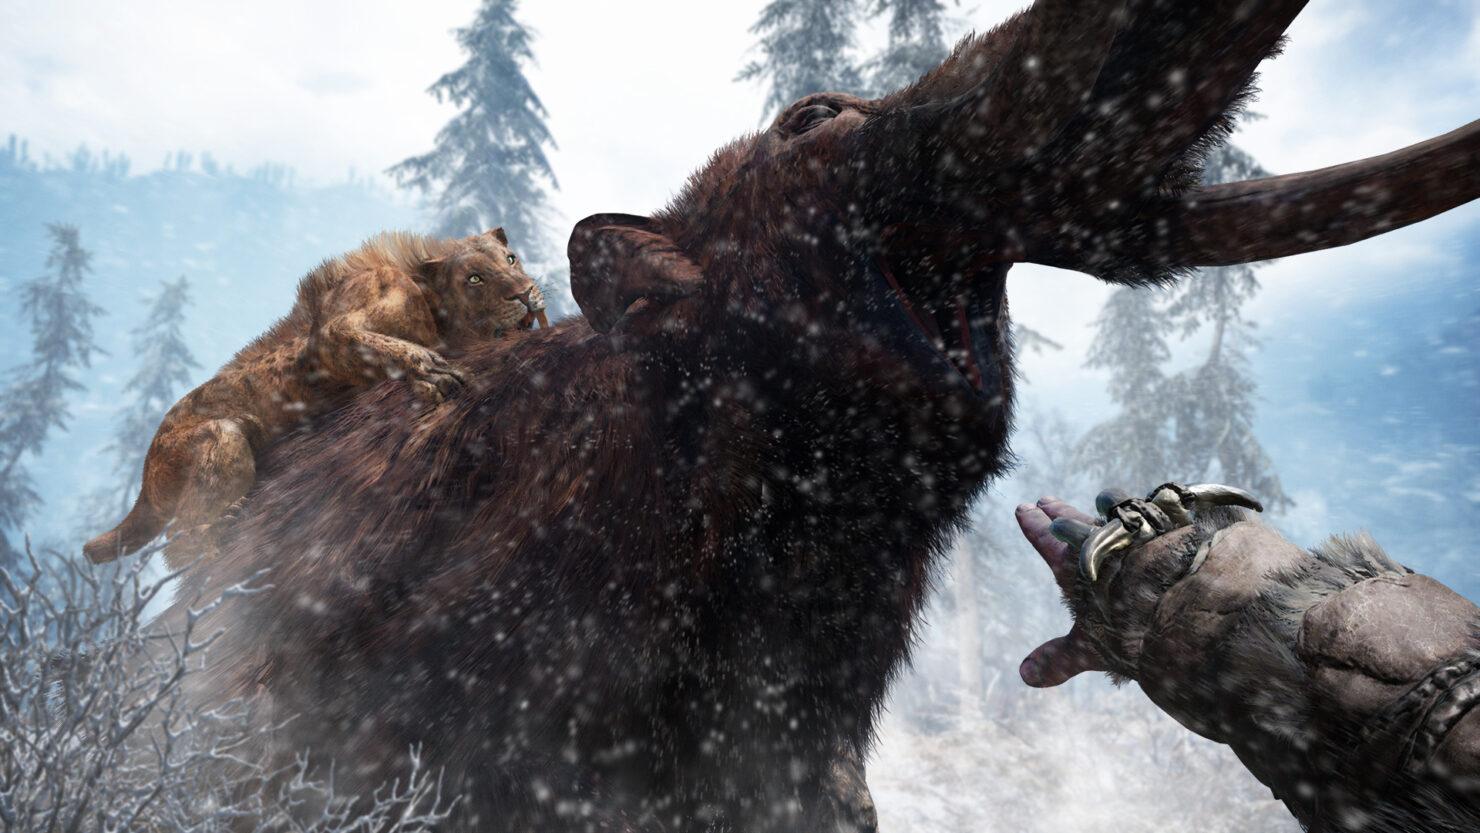 fcp_screen_sbtiger_vs_mammoth_beastmaster_reveal_151204_5am_cet_1449234199